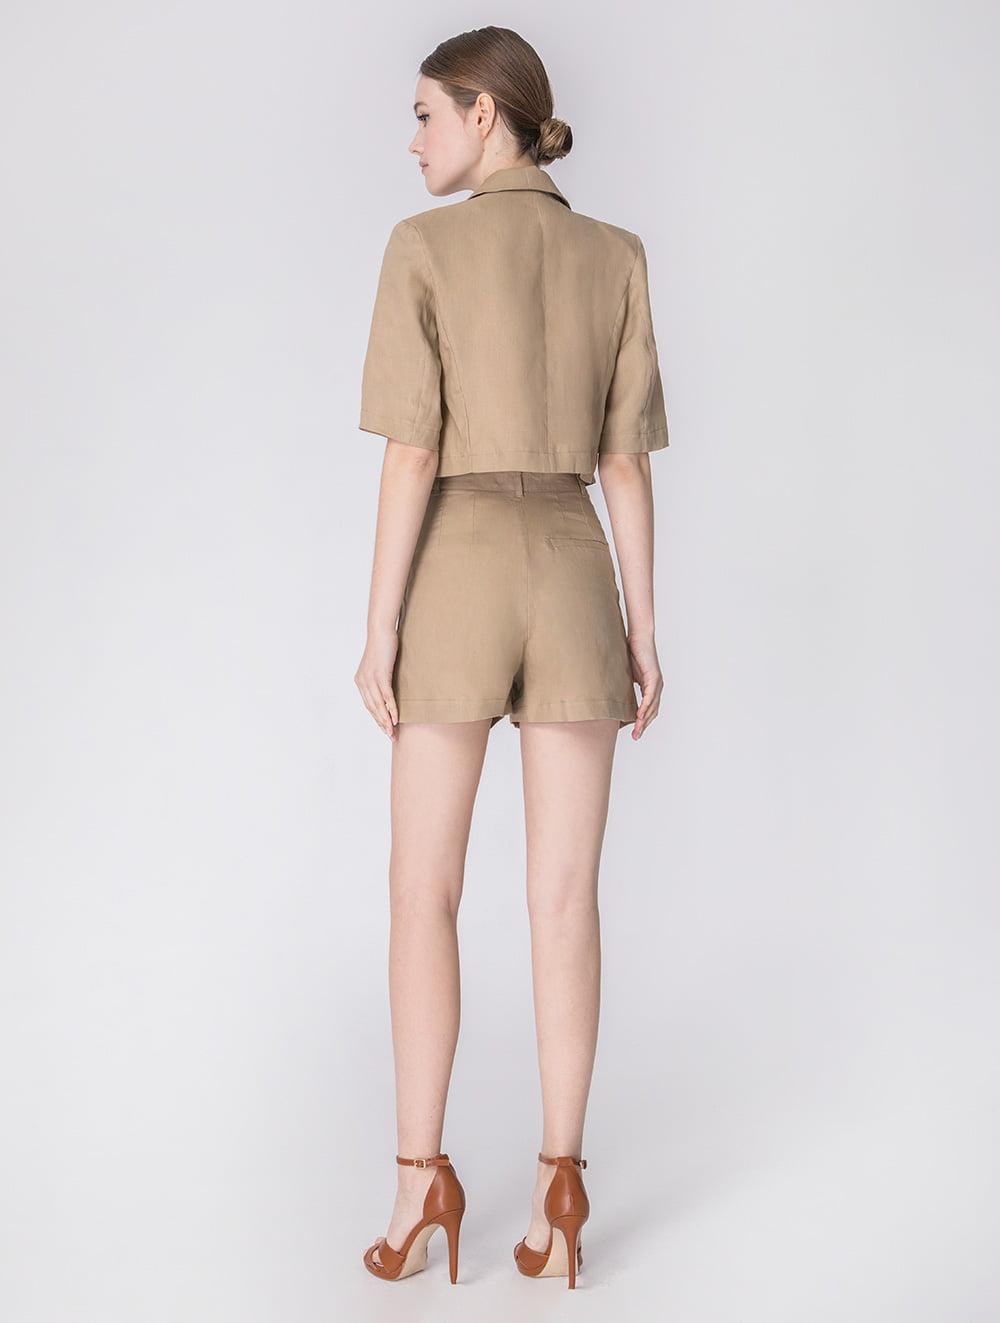 Arete shorts